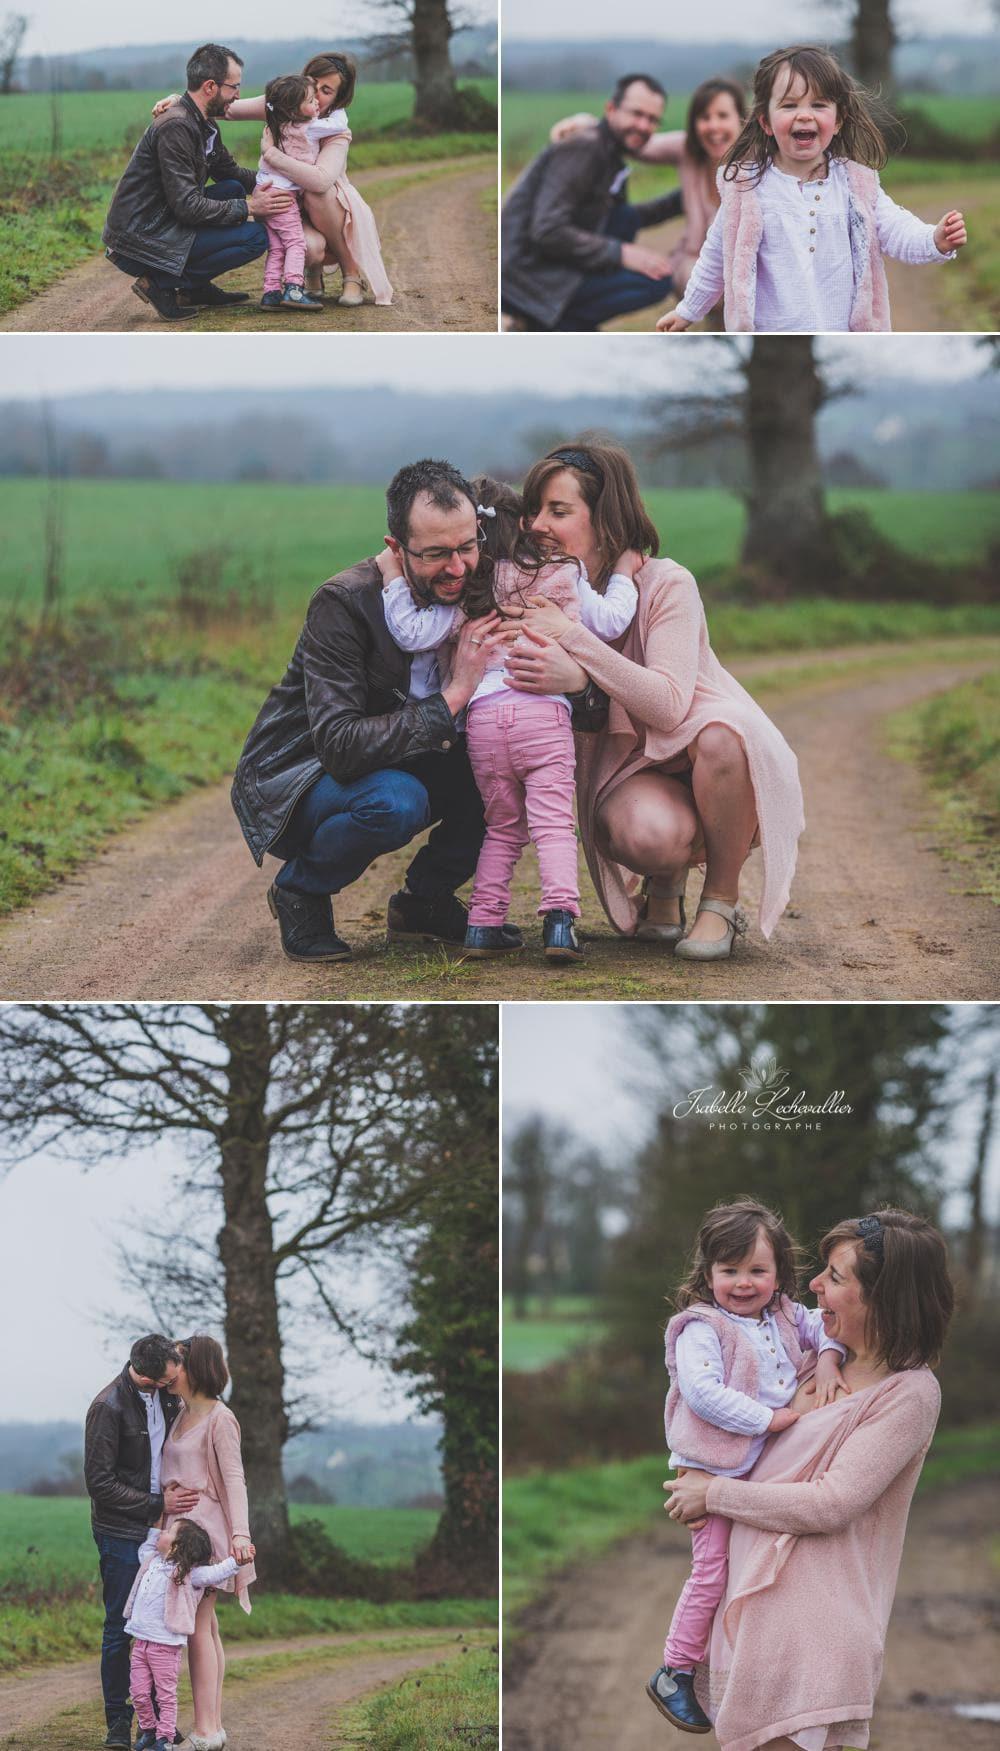 Annoncer votre grossesse en images